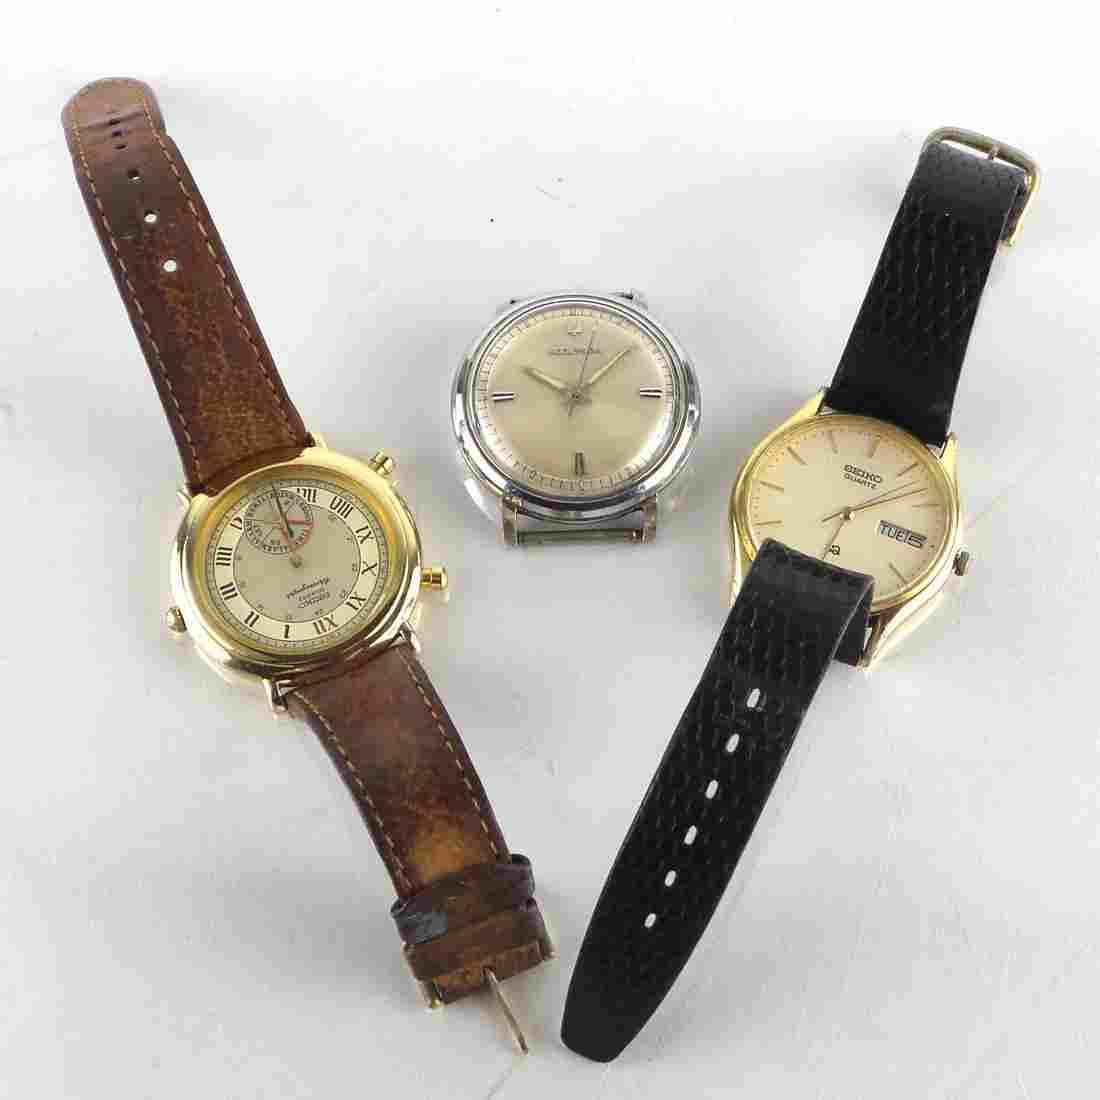 Seiko and Bulova Wrist Watches